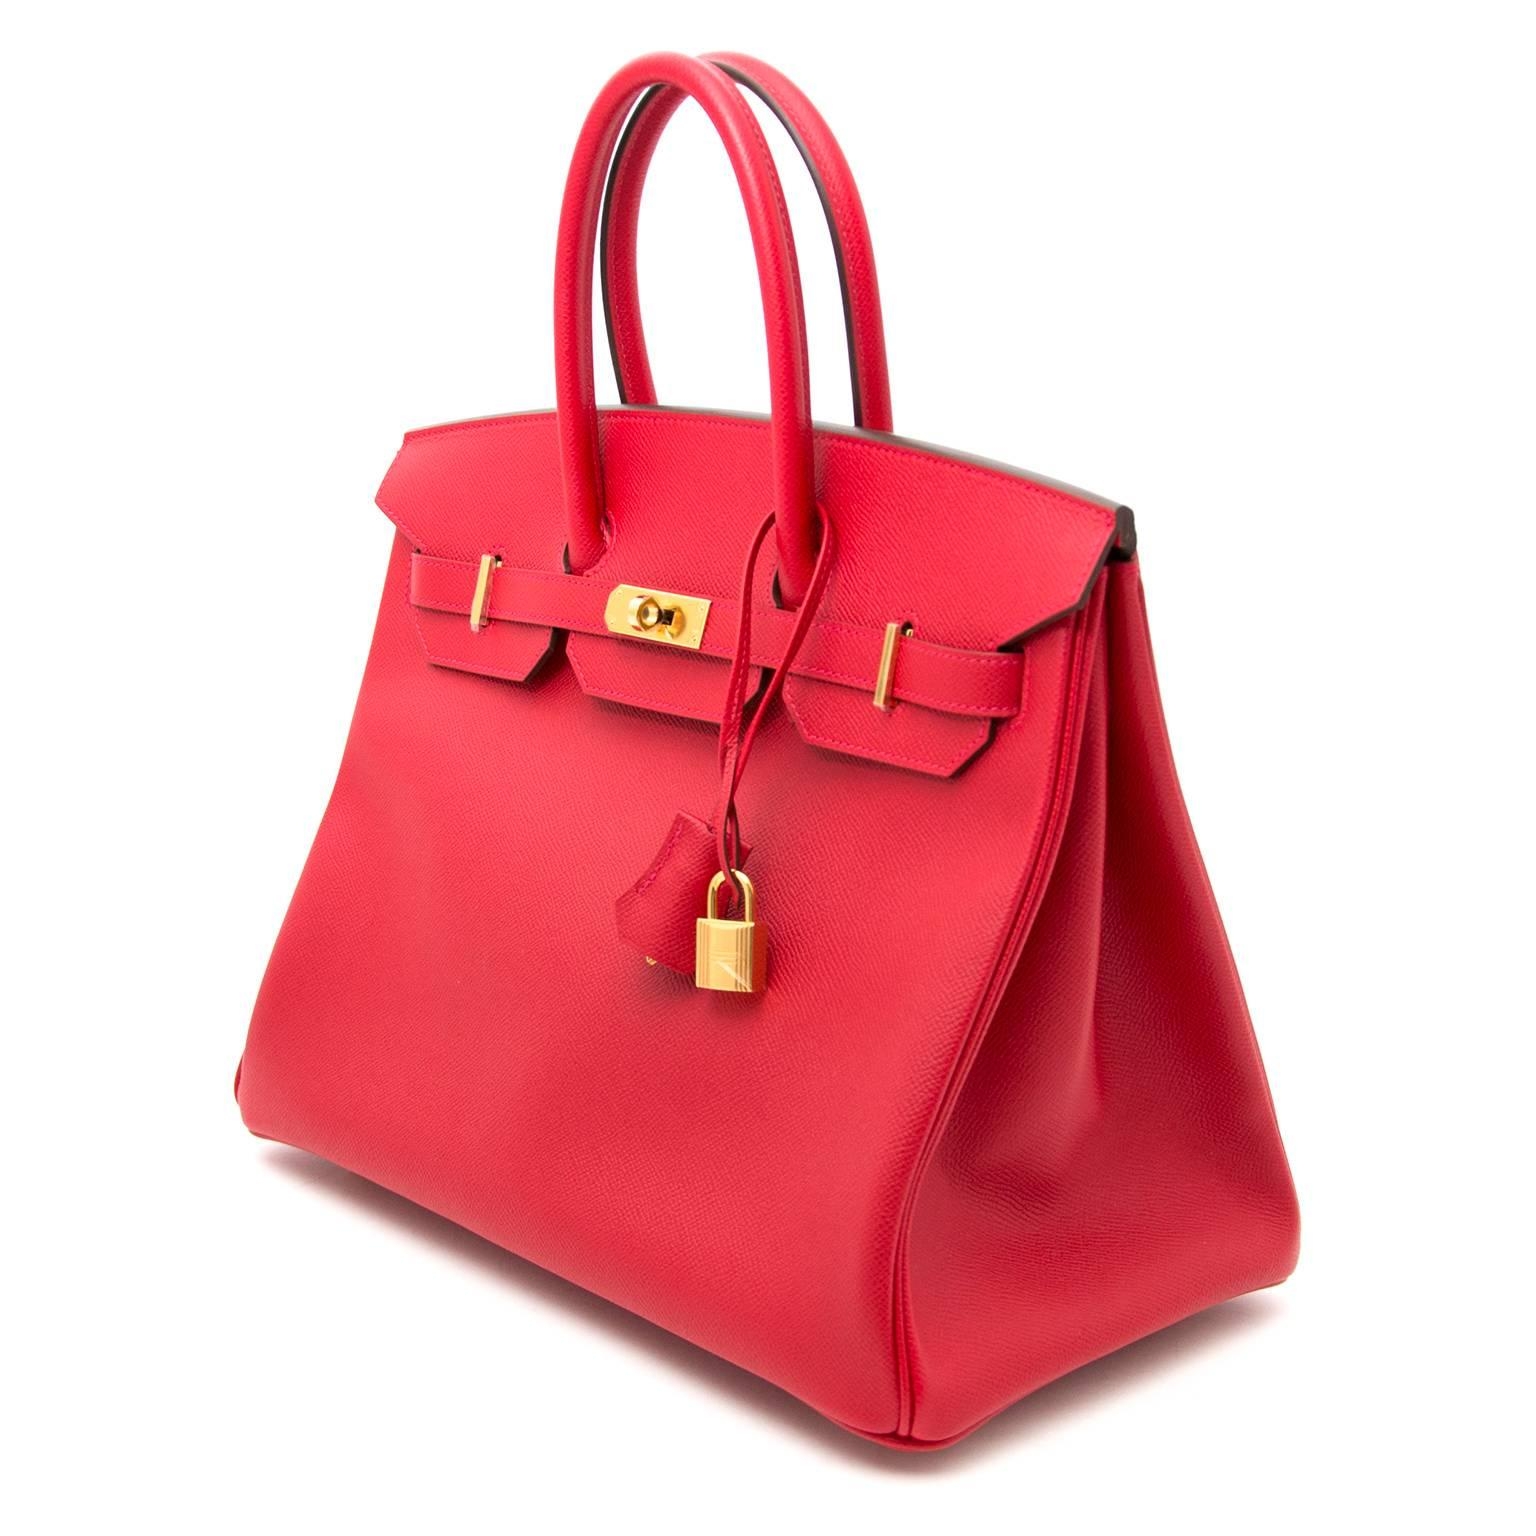 Brand New Hermes Birkin 35 Rouge Casaque Epsom GHW at 1stdibs 26e52113b4